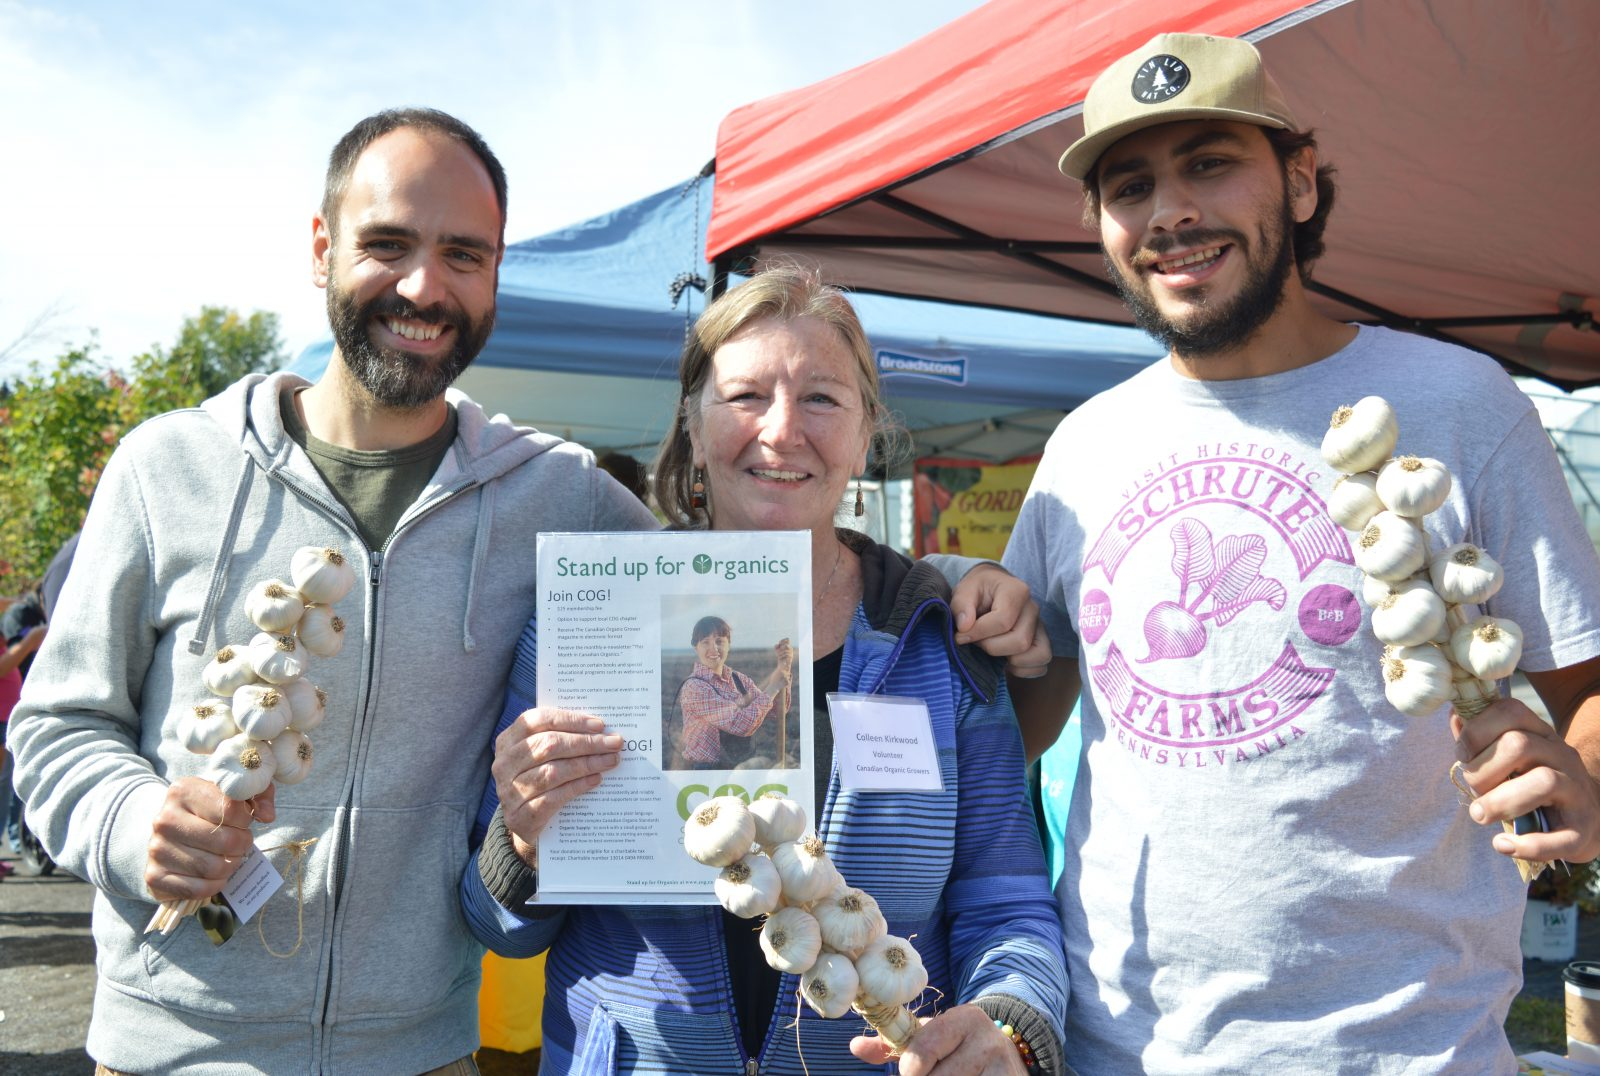 Garlic Festival showcases local goods